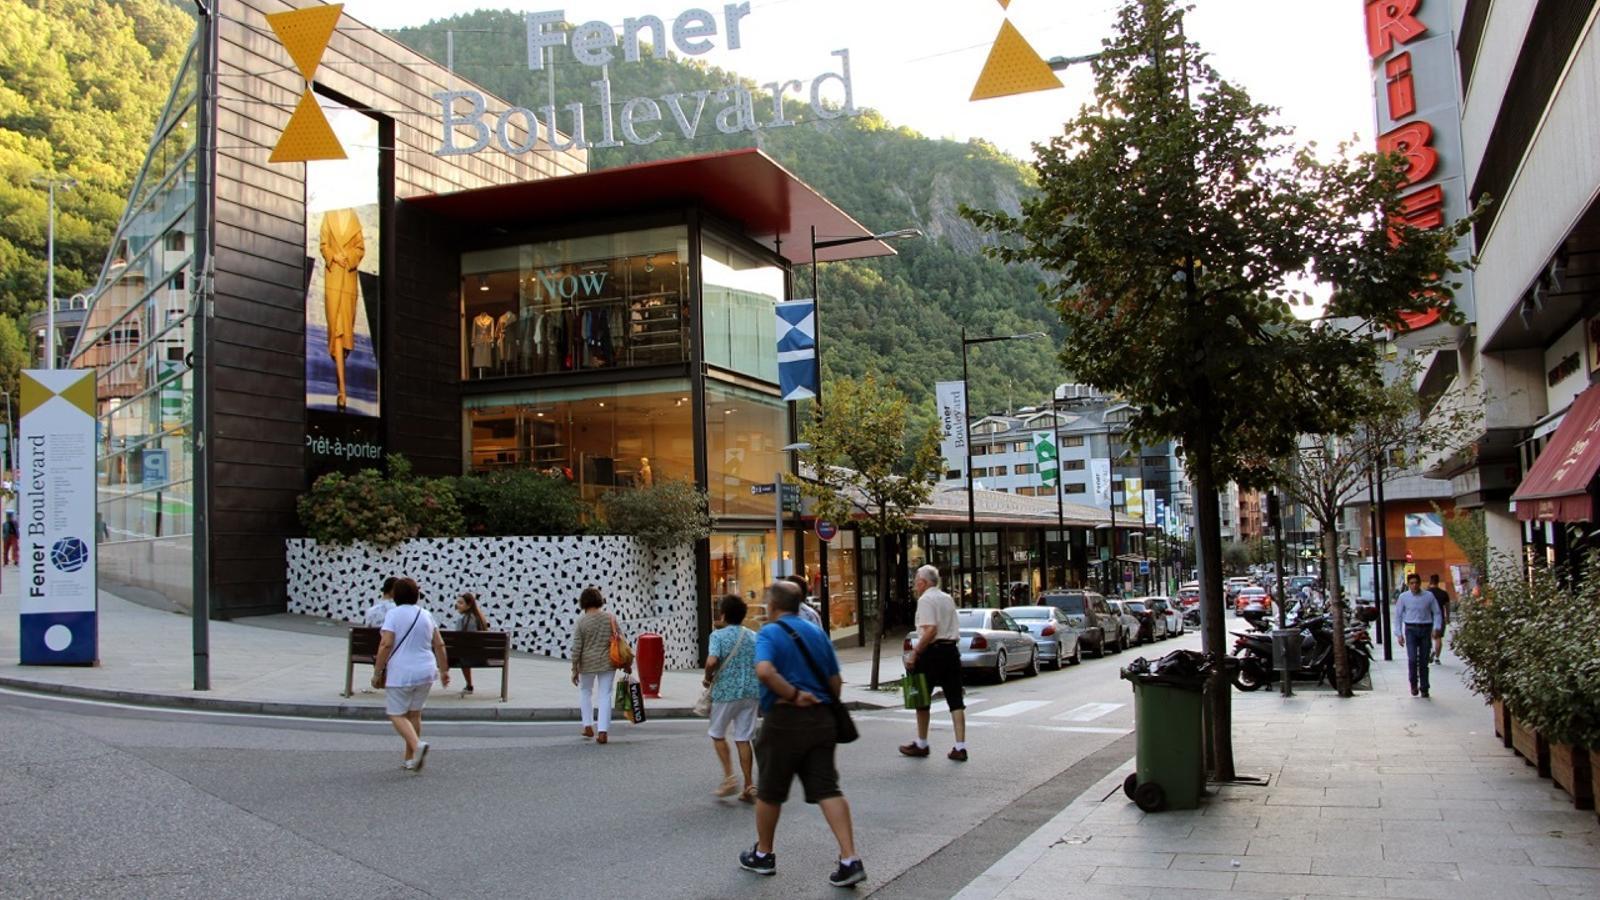 El Fener Boulevard. / C. F.